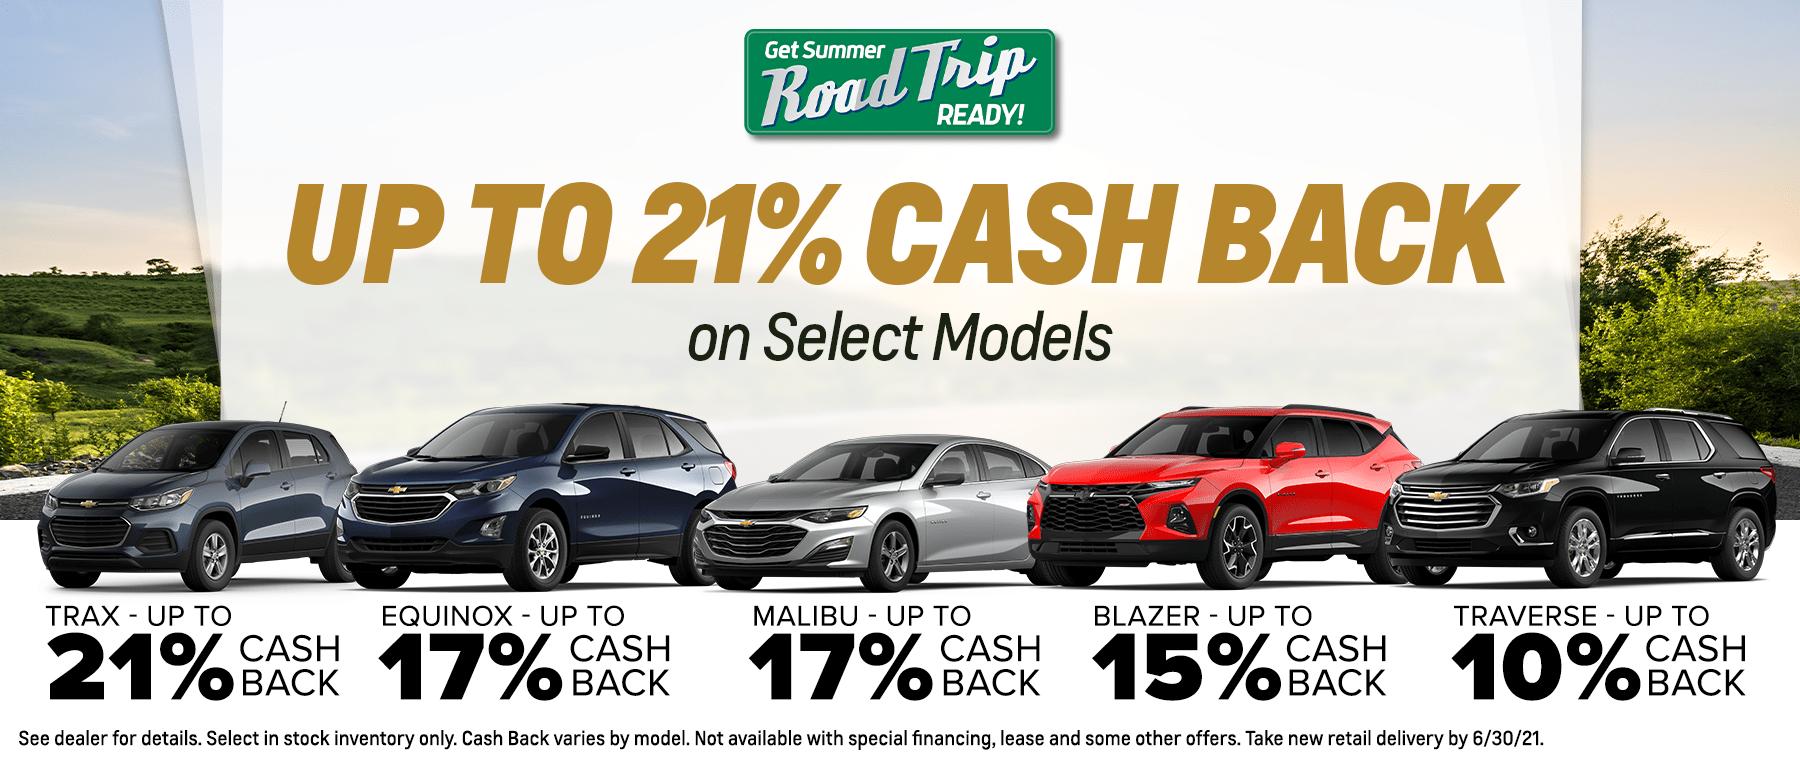 Up to 21% Cash Back